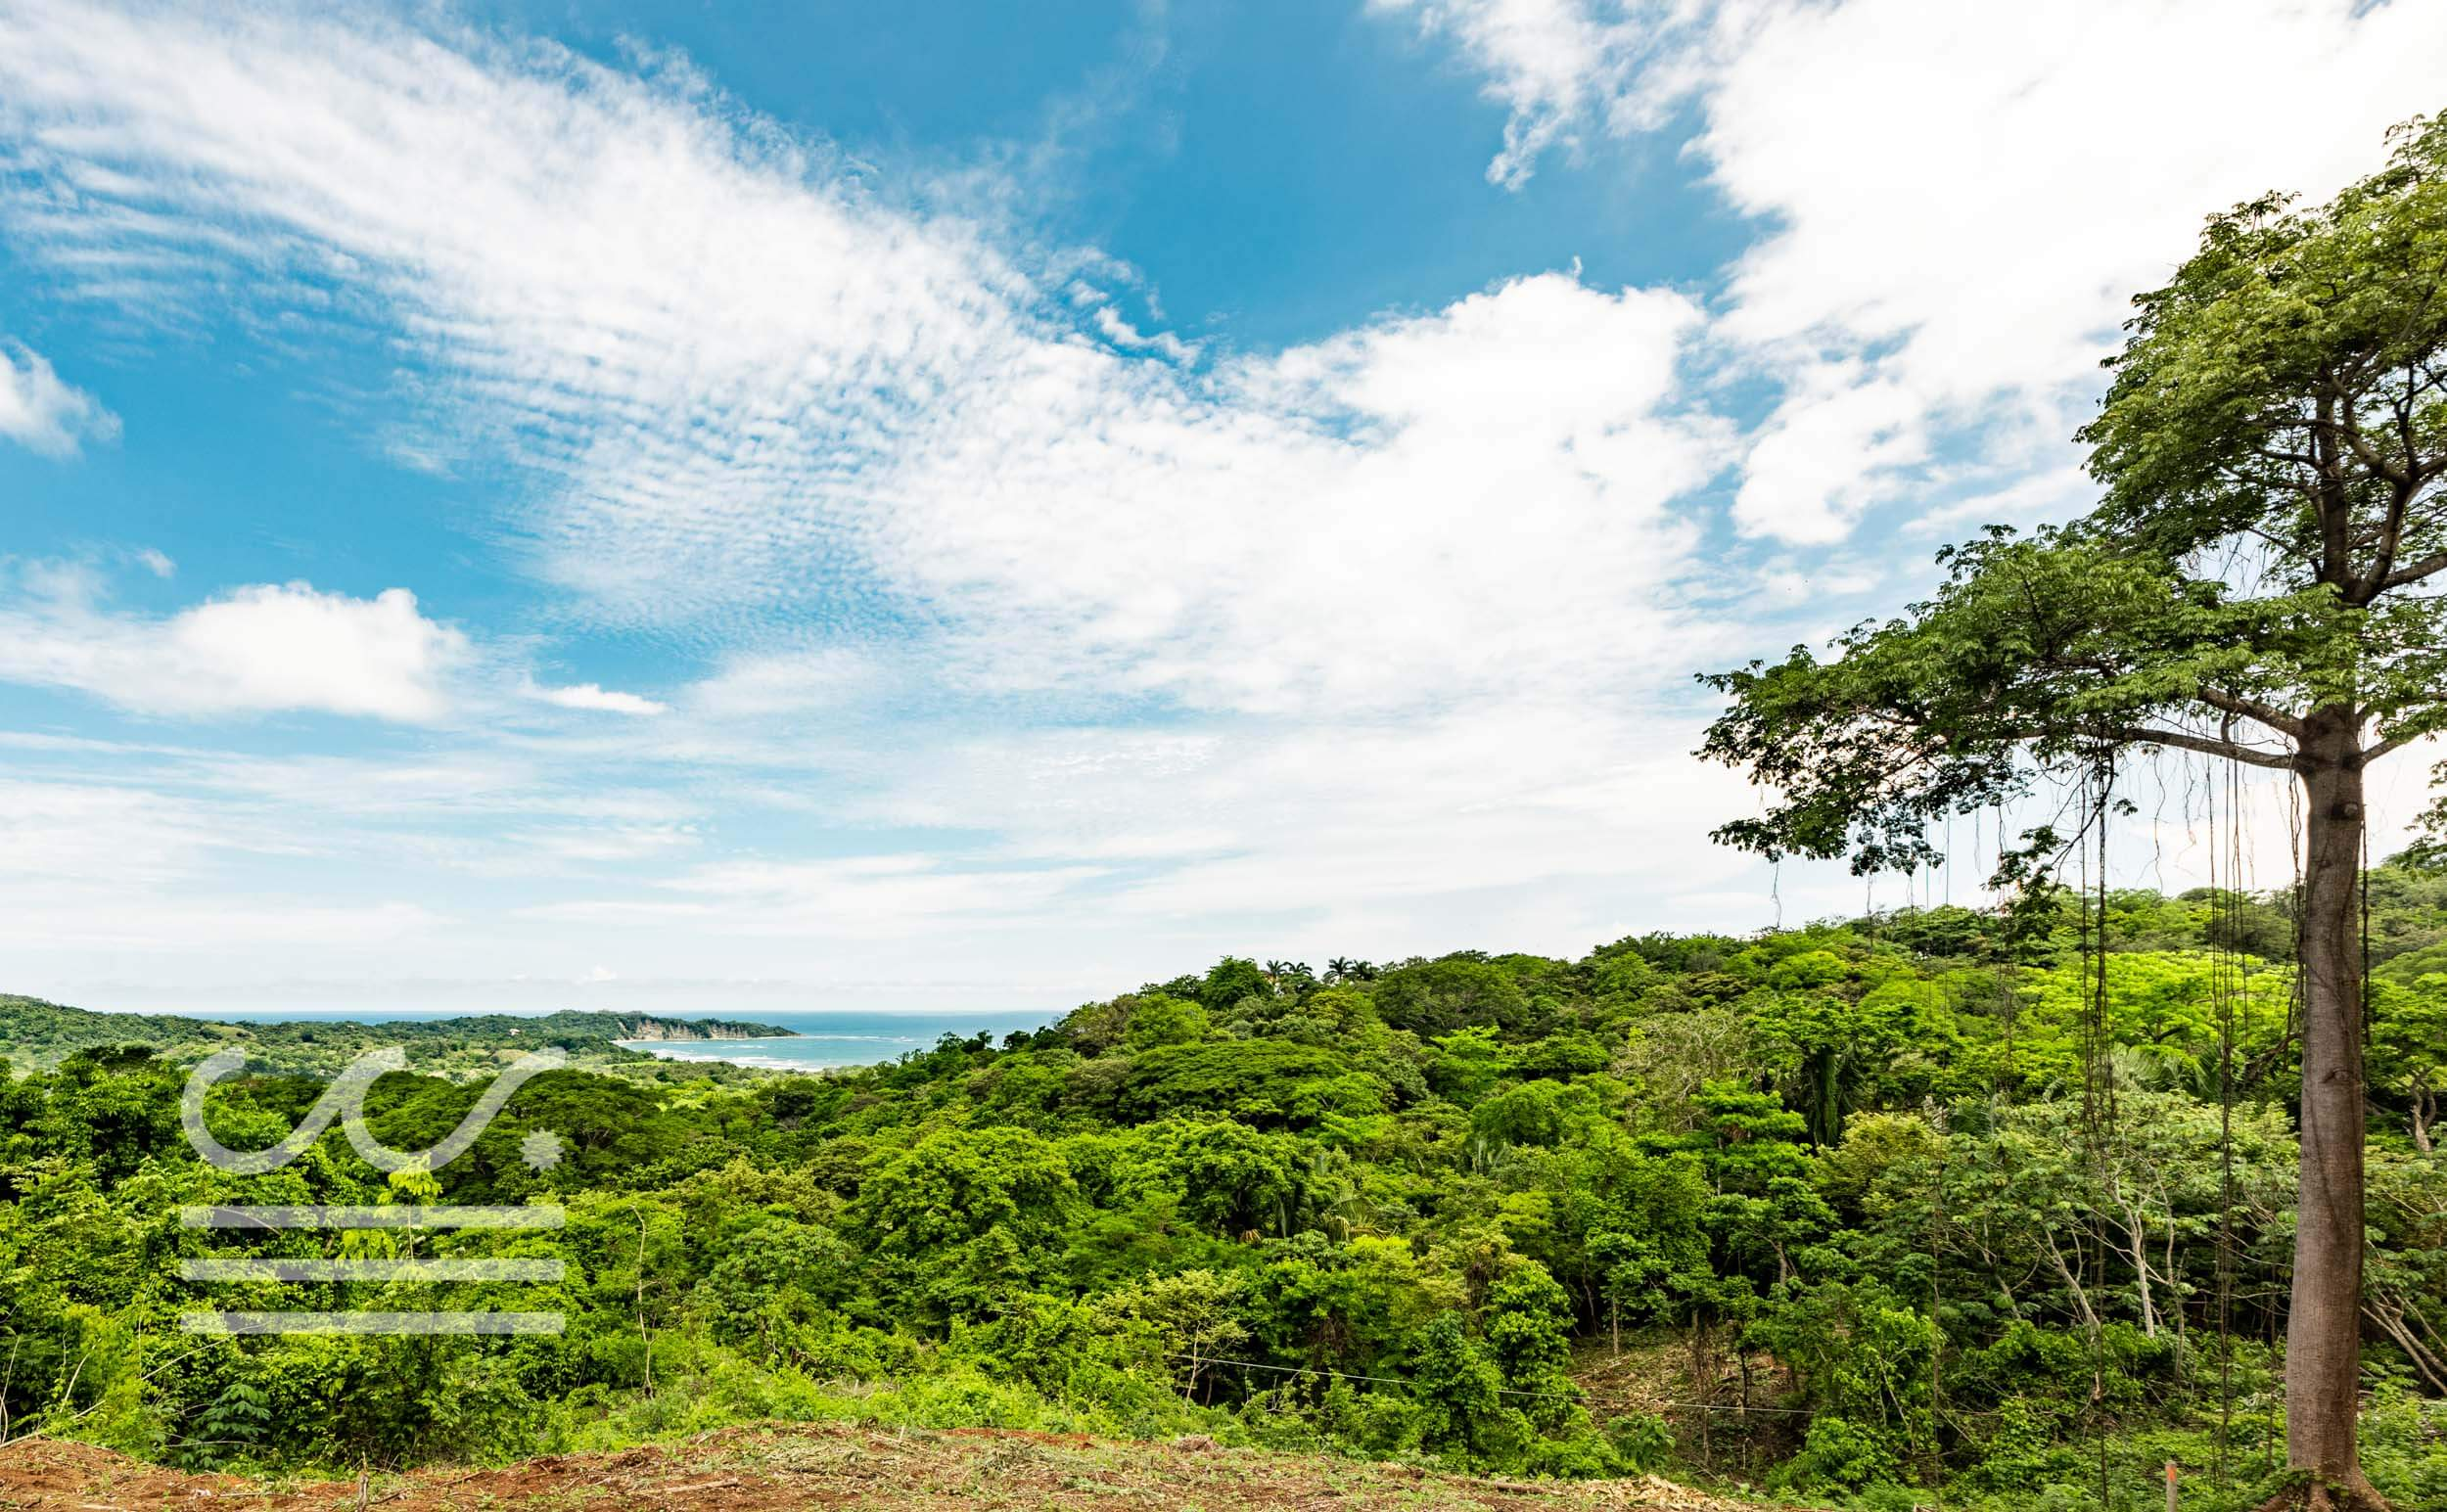 EE-101-Lot-Wanderlust-Realty-Real-Estate-Nosara-Costa-Rica-9compressed.jpg